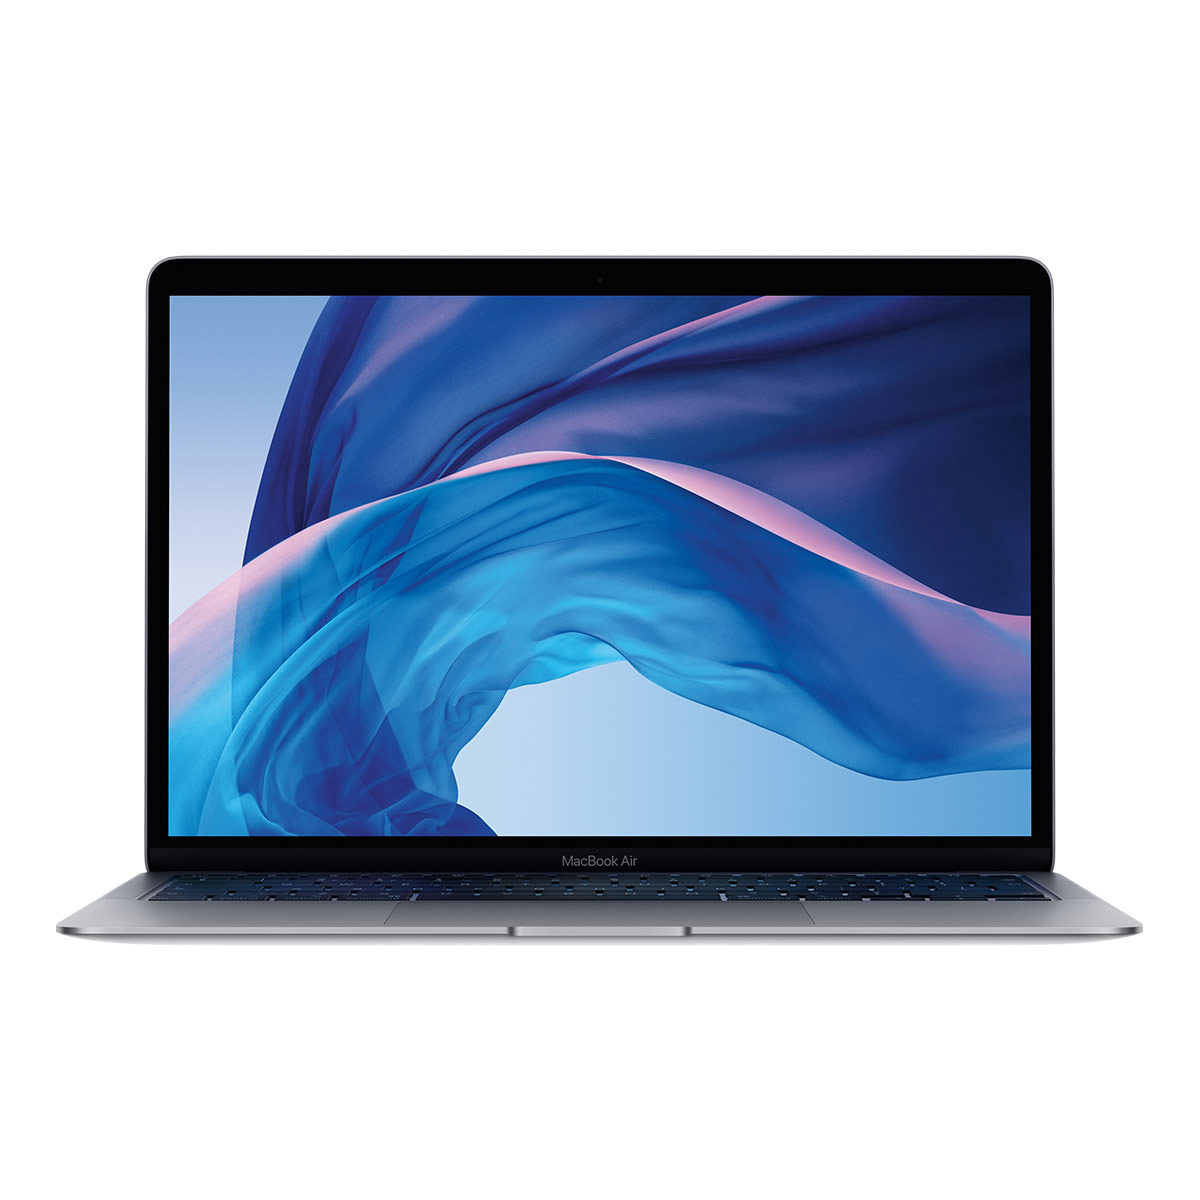 "MacBook Air 13"" i3 1.1GHz 8GB 256GB Iris Plus Space Grey"